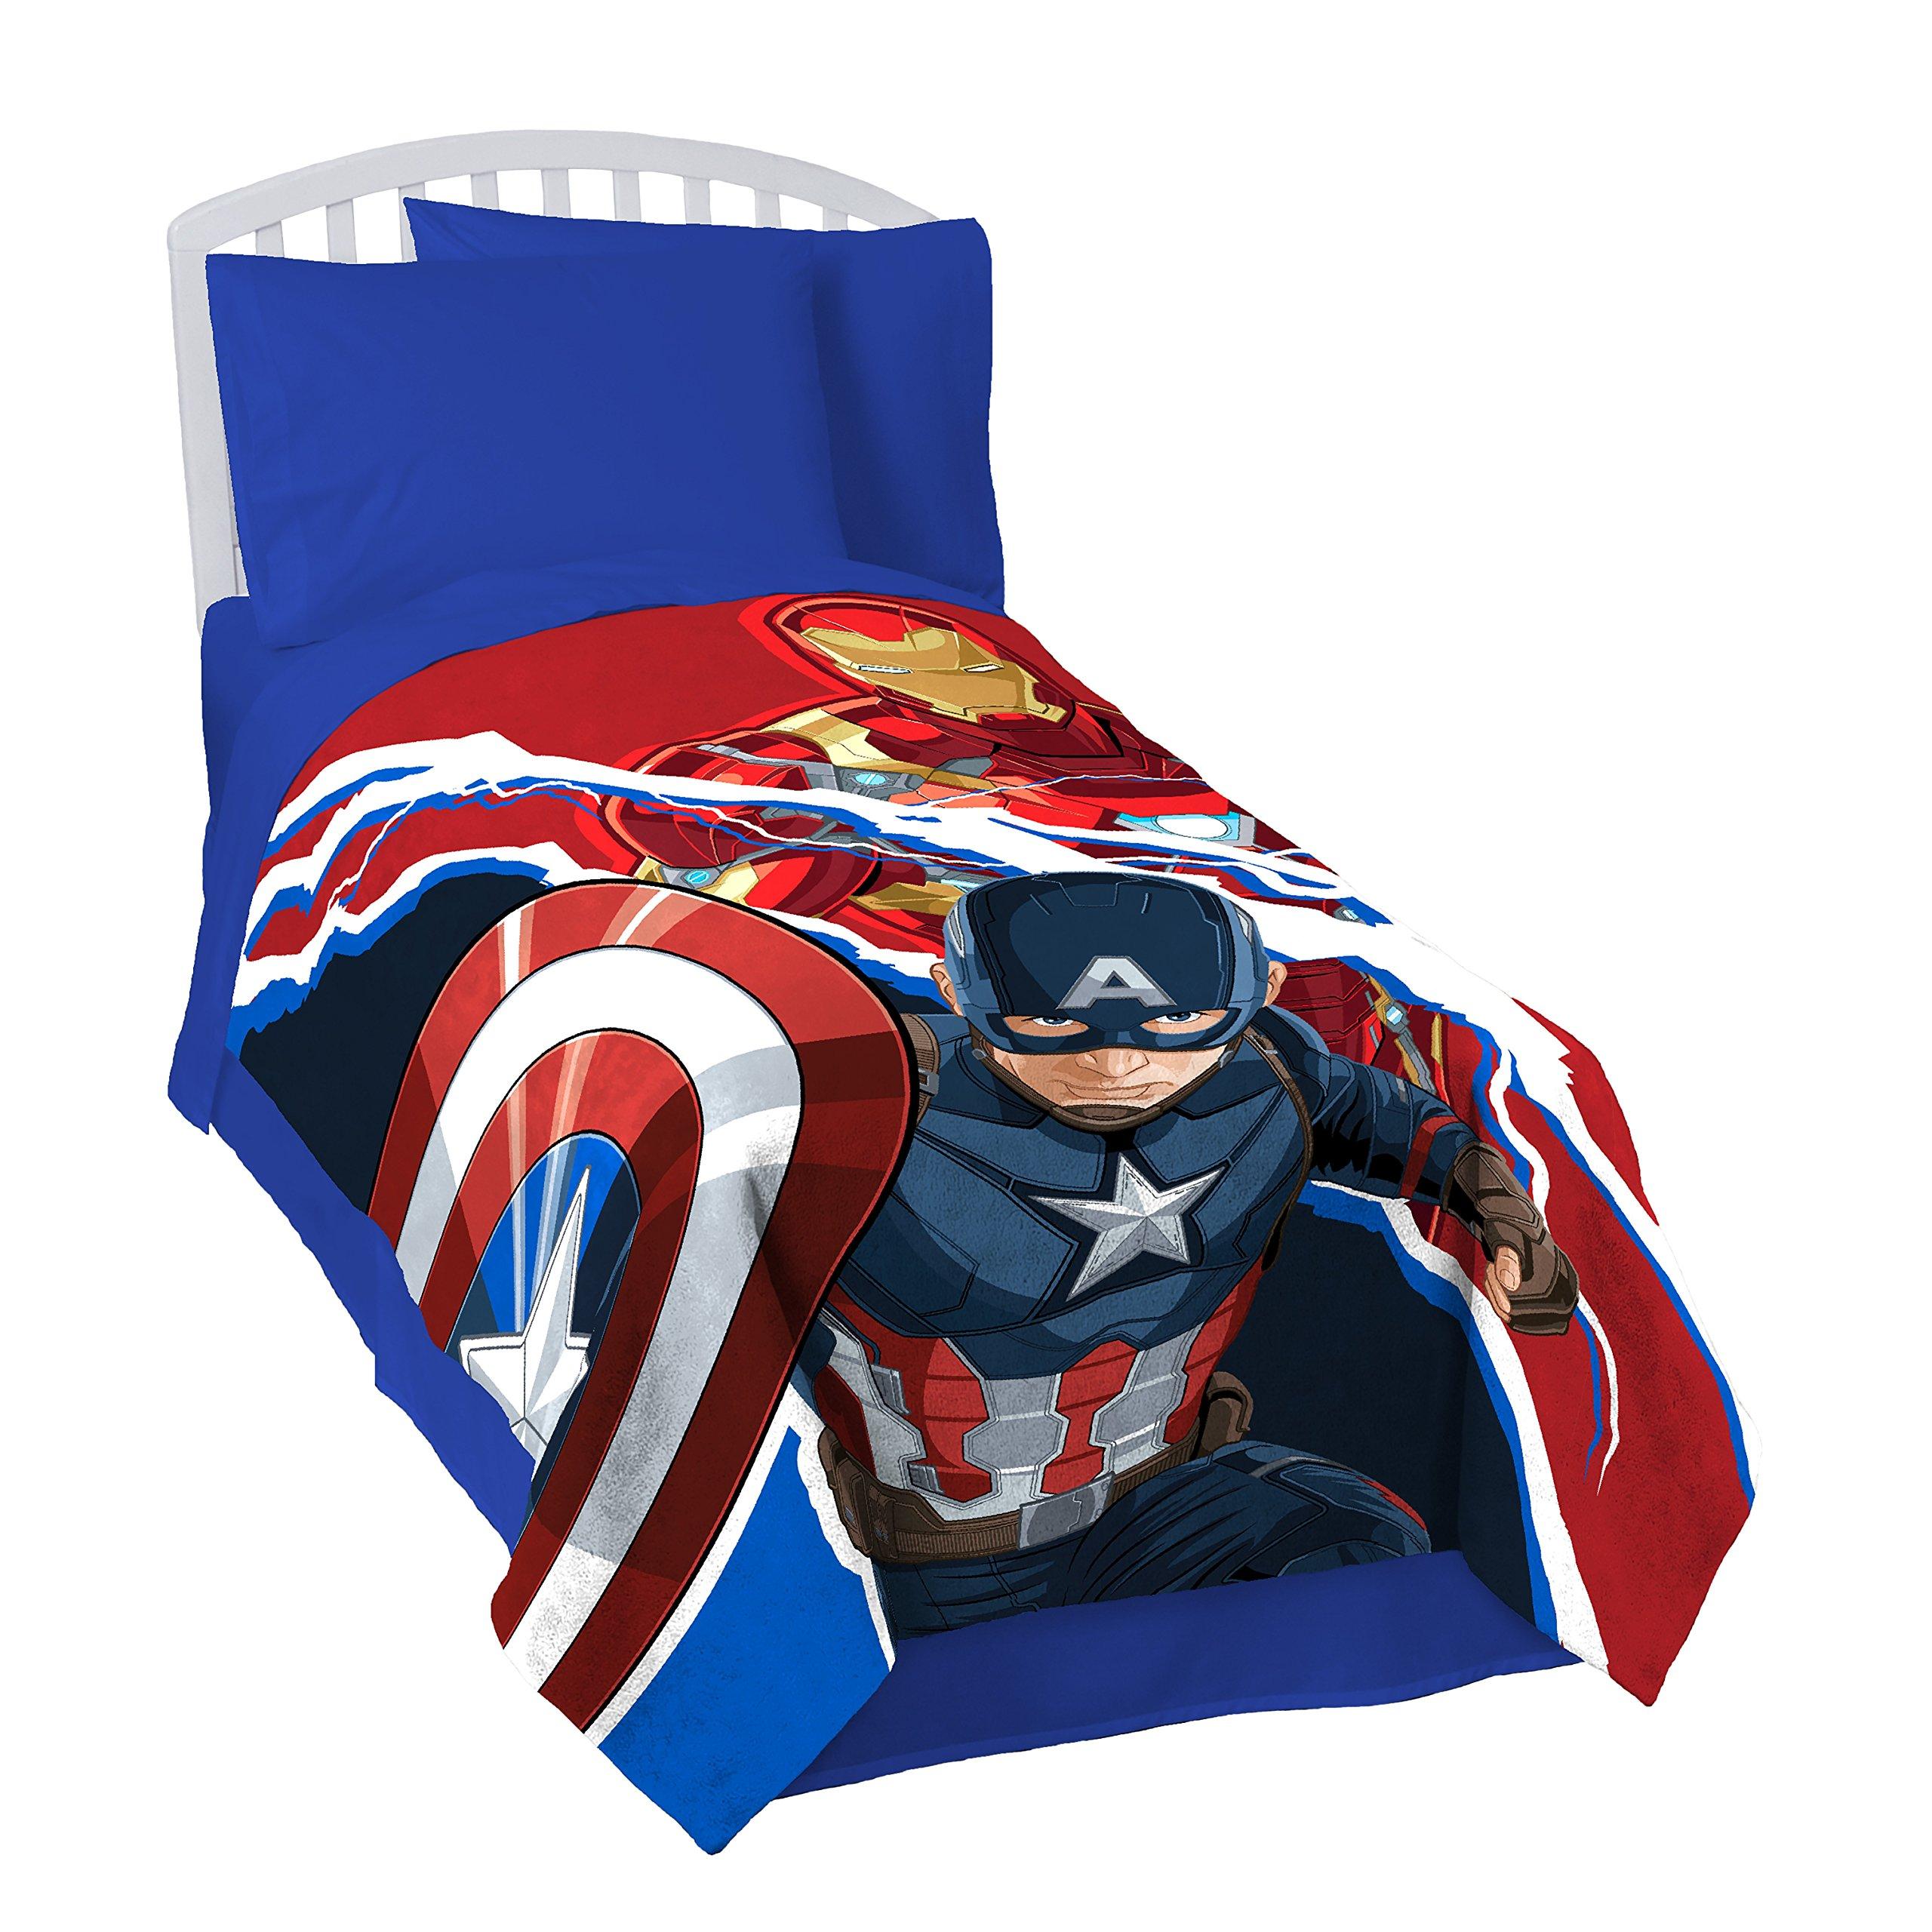 Marvel Captain America Civil War Lightning Silk Touch 62'' x 90'' Twin Blanket